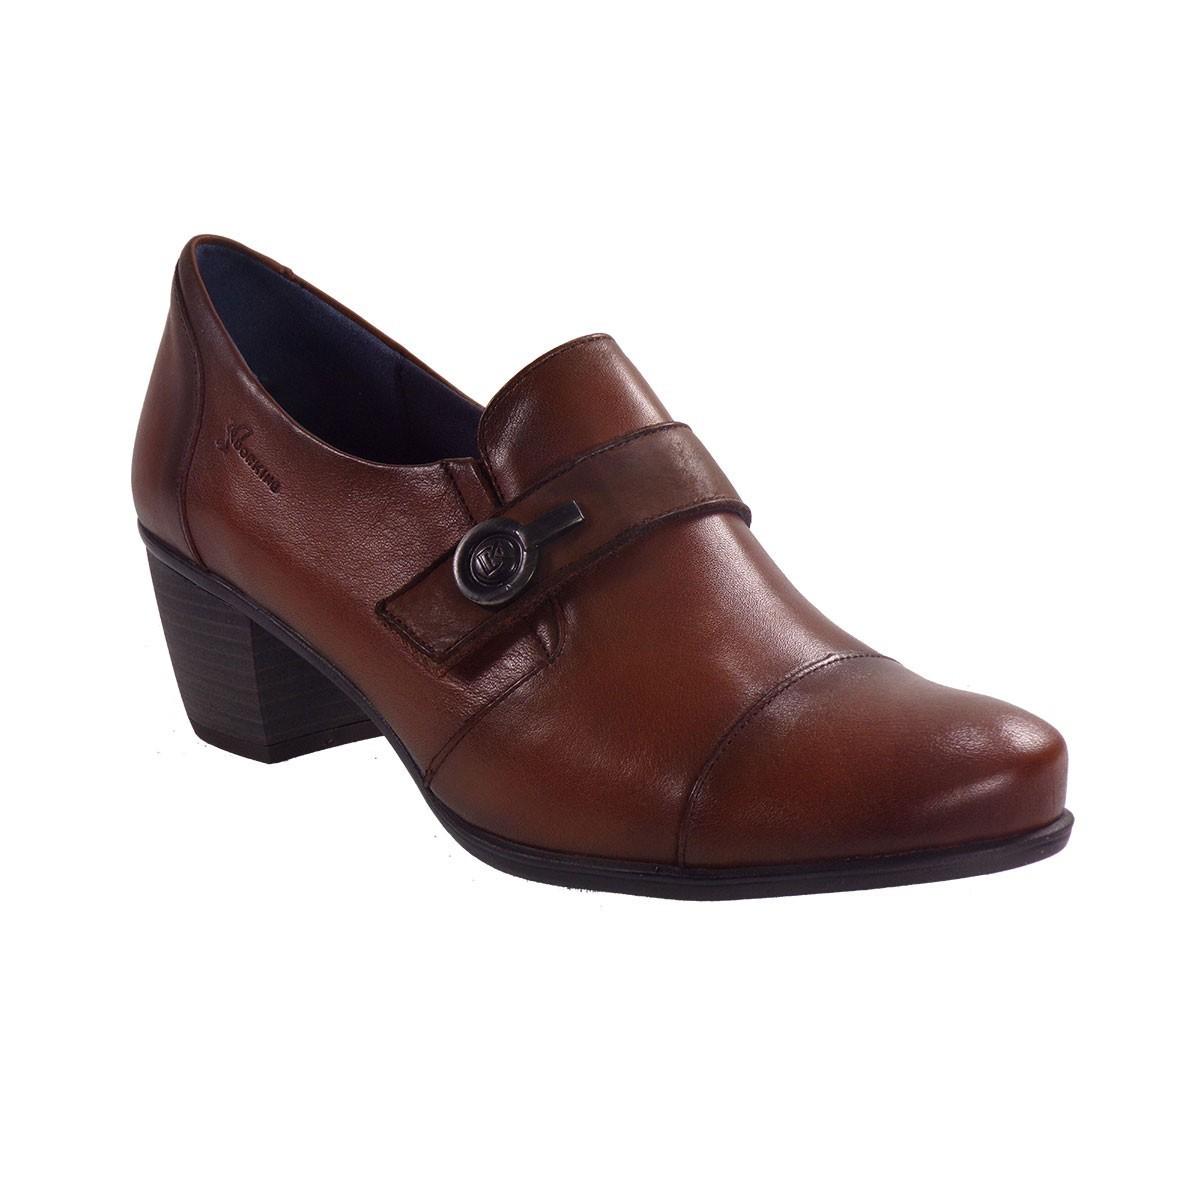 Dorking Γυναικεία Παπούτσια BRΙSPA D7572-SUΝΒ Ταμπά Δέρμα